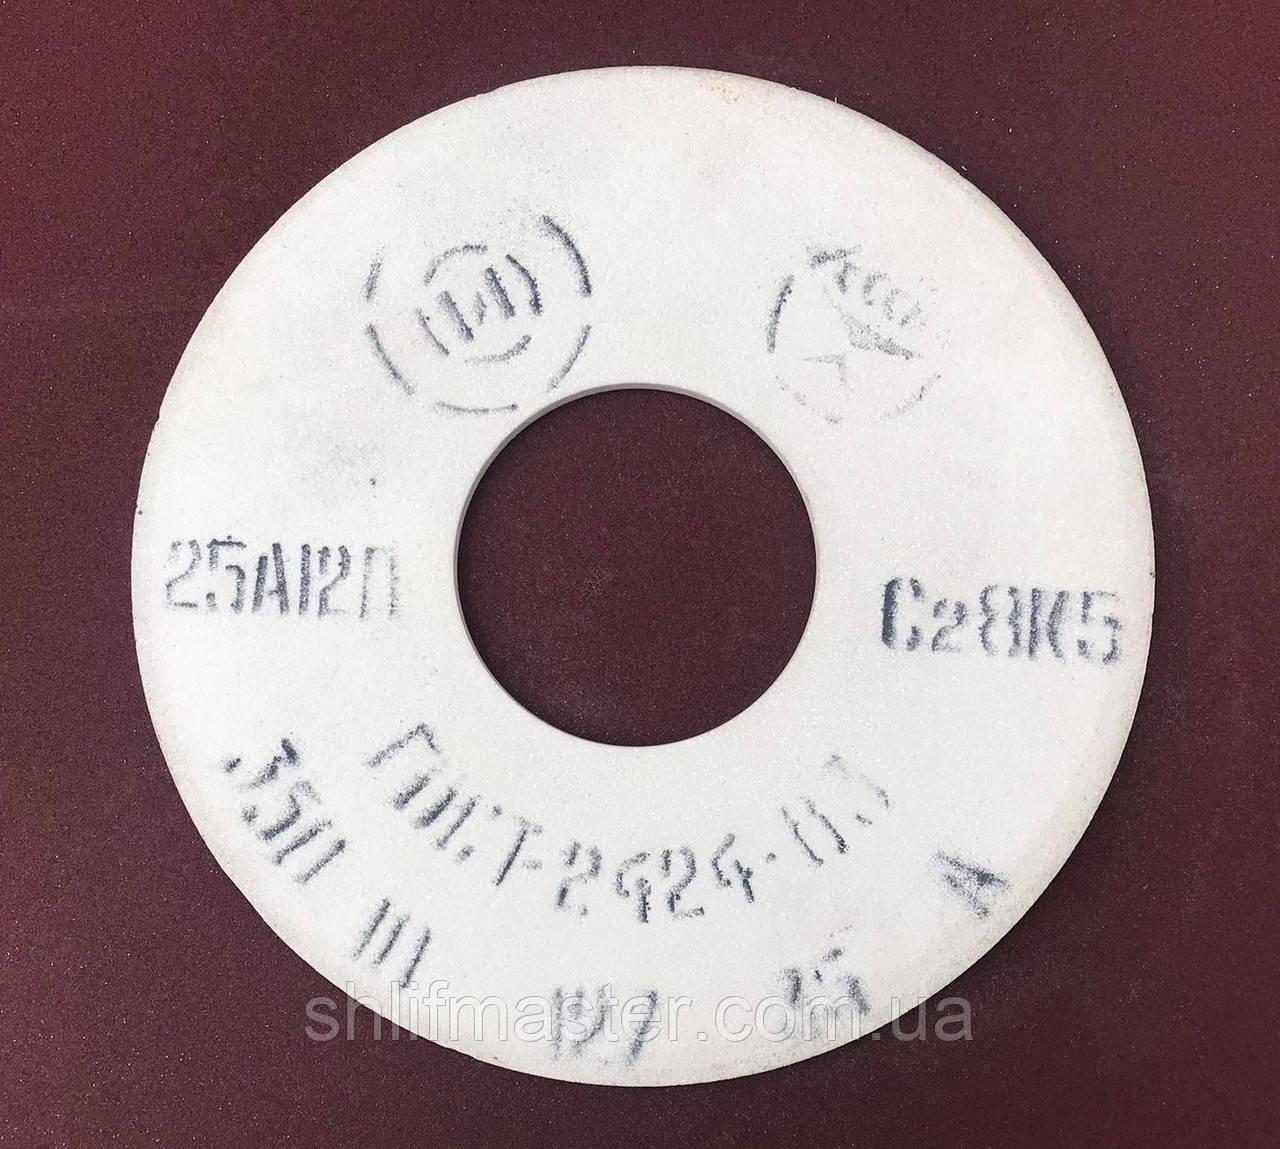 Абразивный круг шлифовальный электрокорунд белый 25А ПП 350х25х127 25-40 М-СМ/F60-F40 H-K